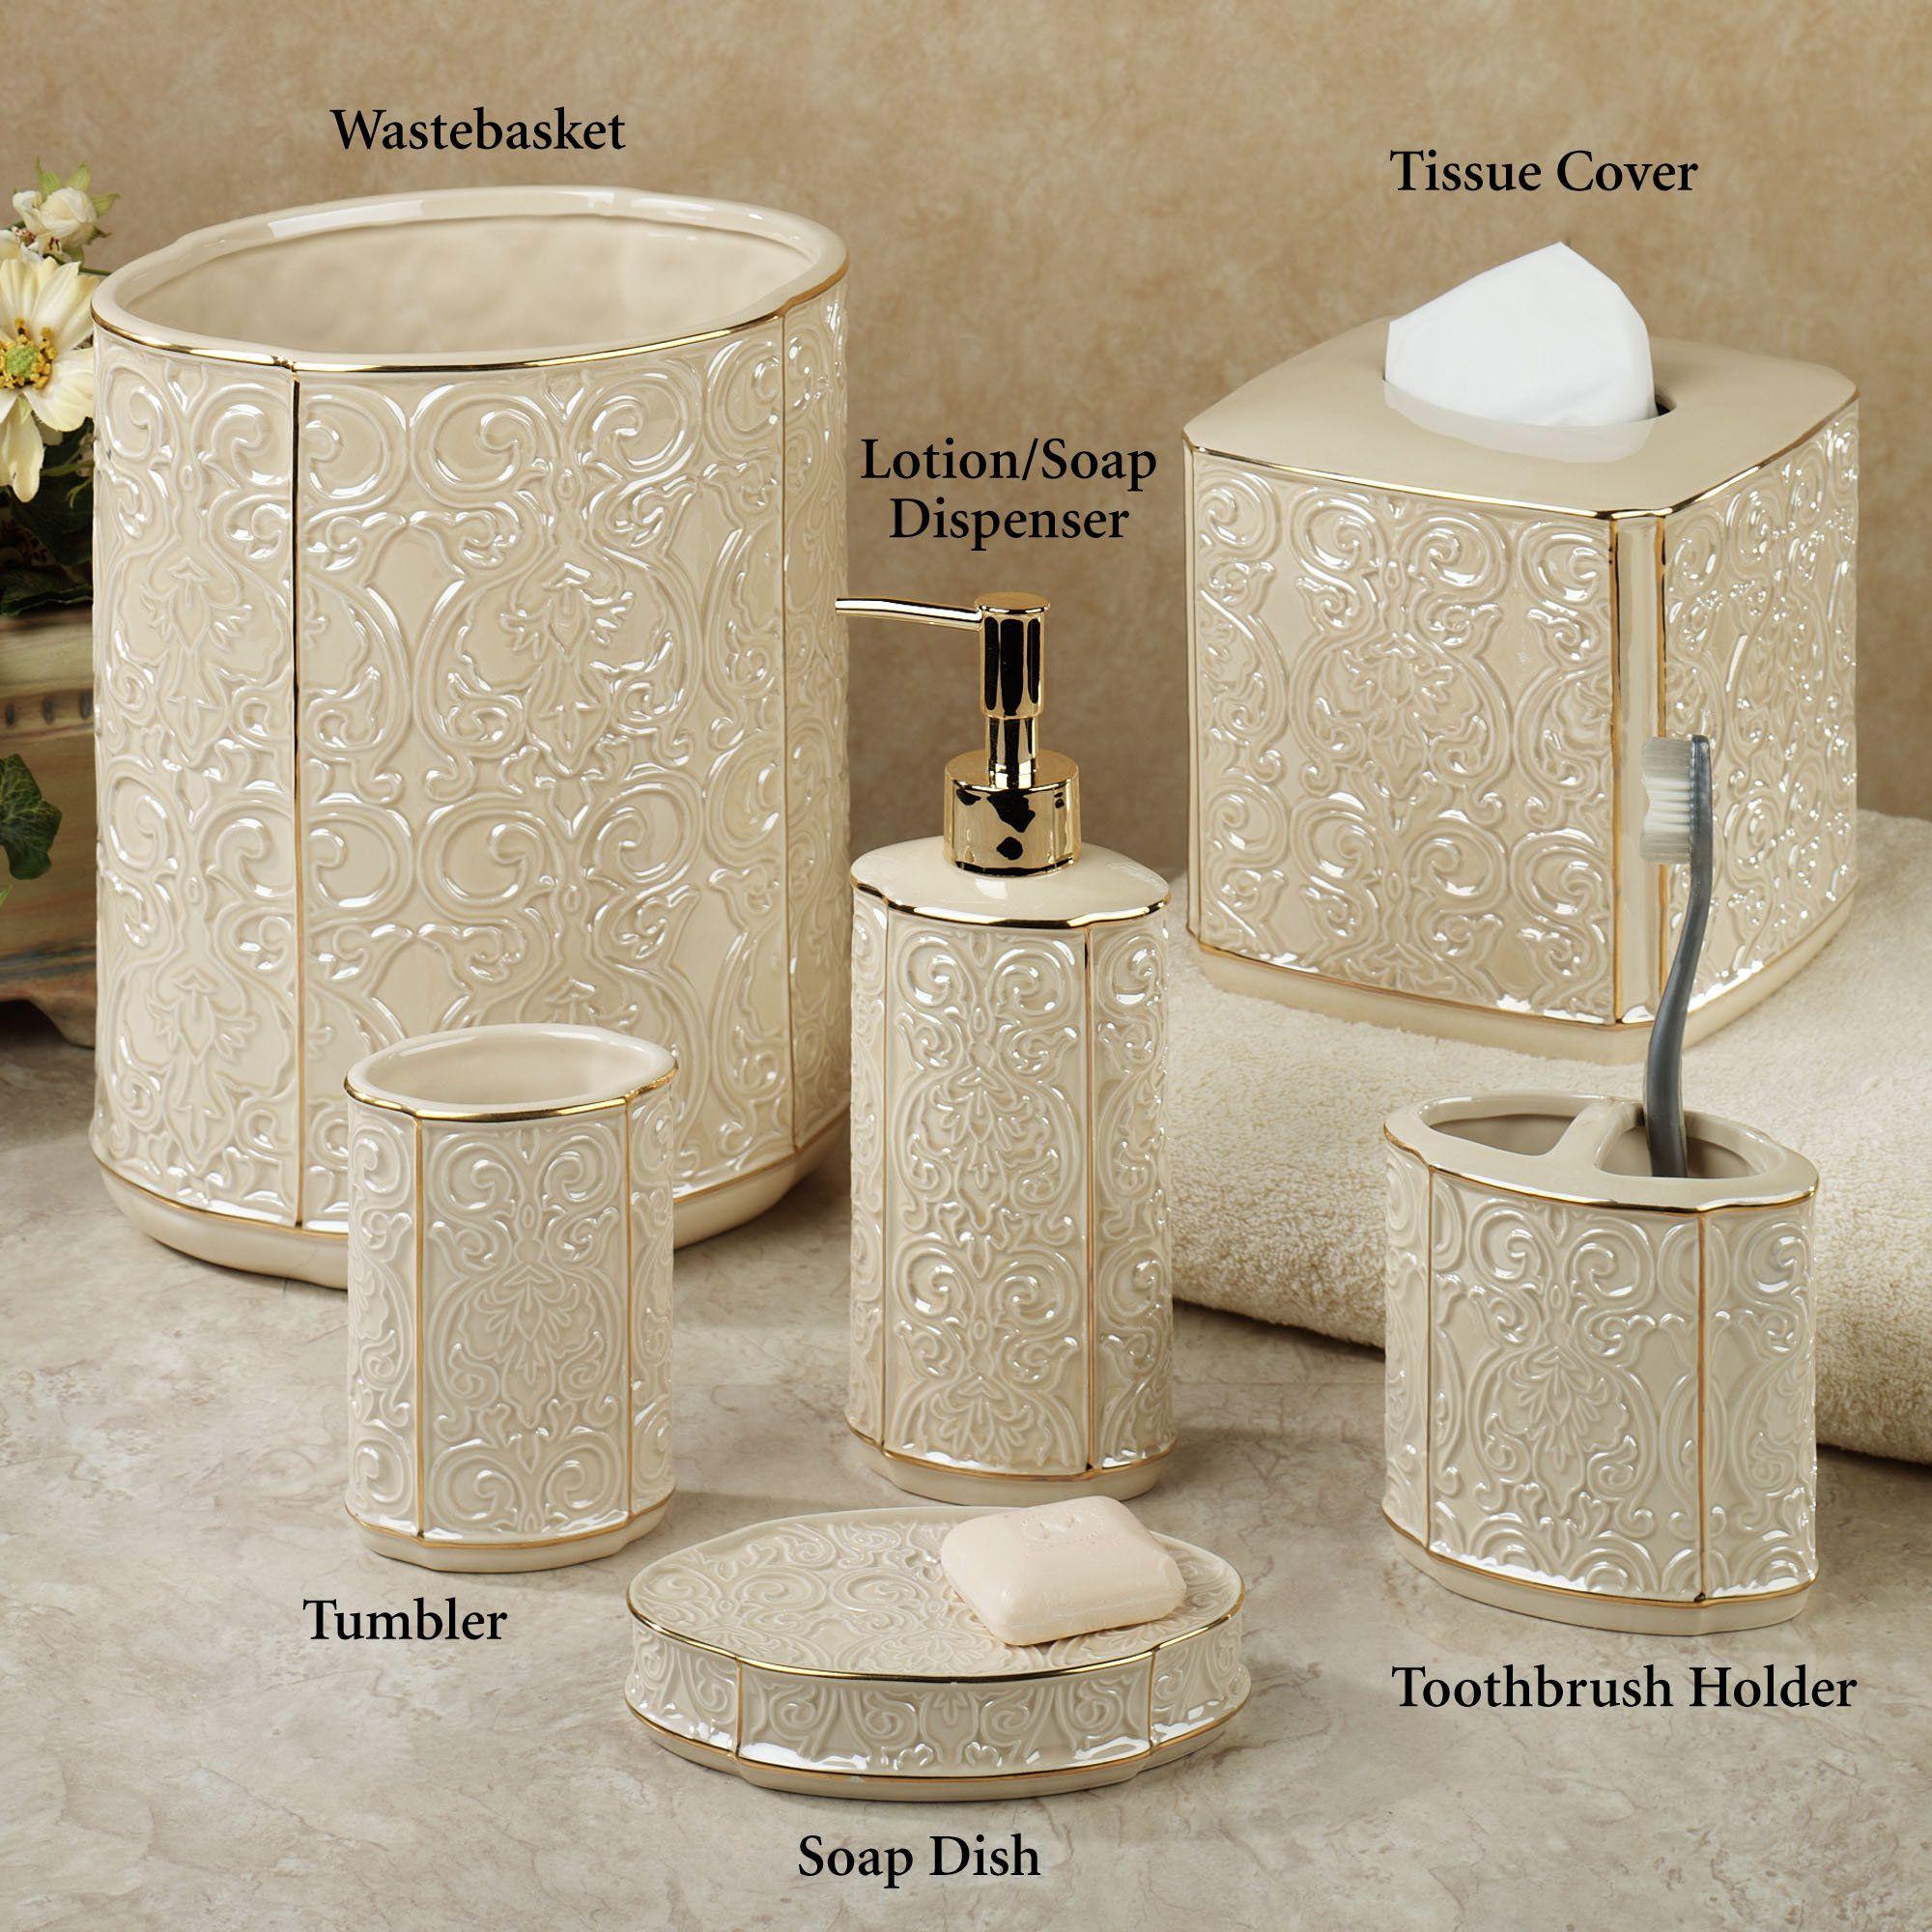 Furla Lotion Soap Dispenser Cream Gold Bathroom Accessories Bathroom Accessories Sets Bathroom Accessories